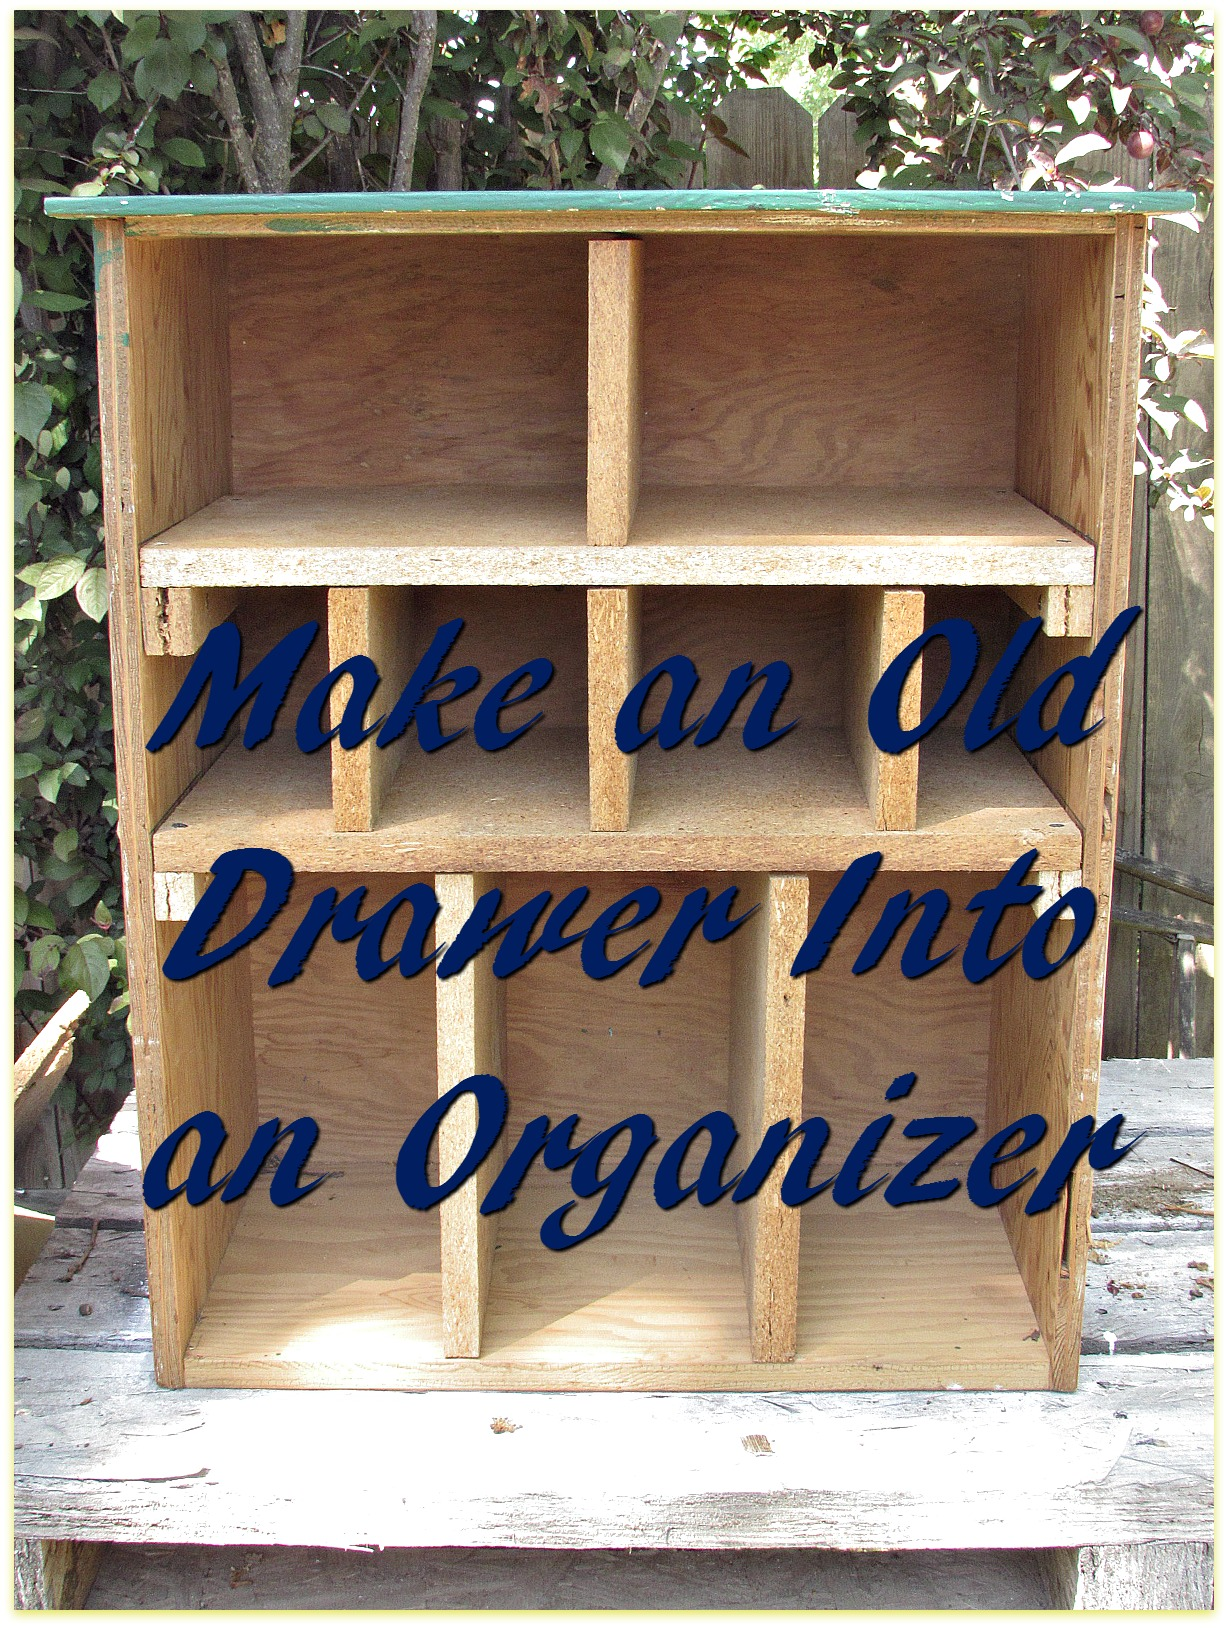 drawer organizer title